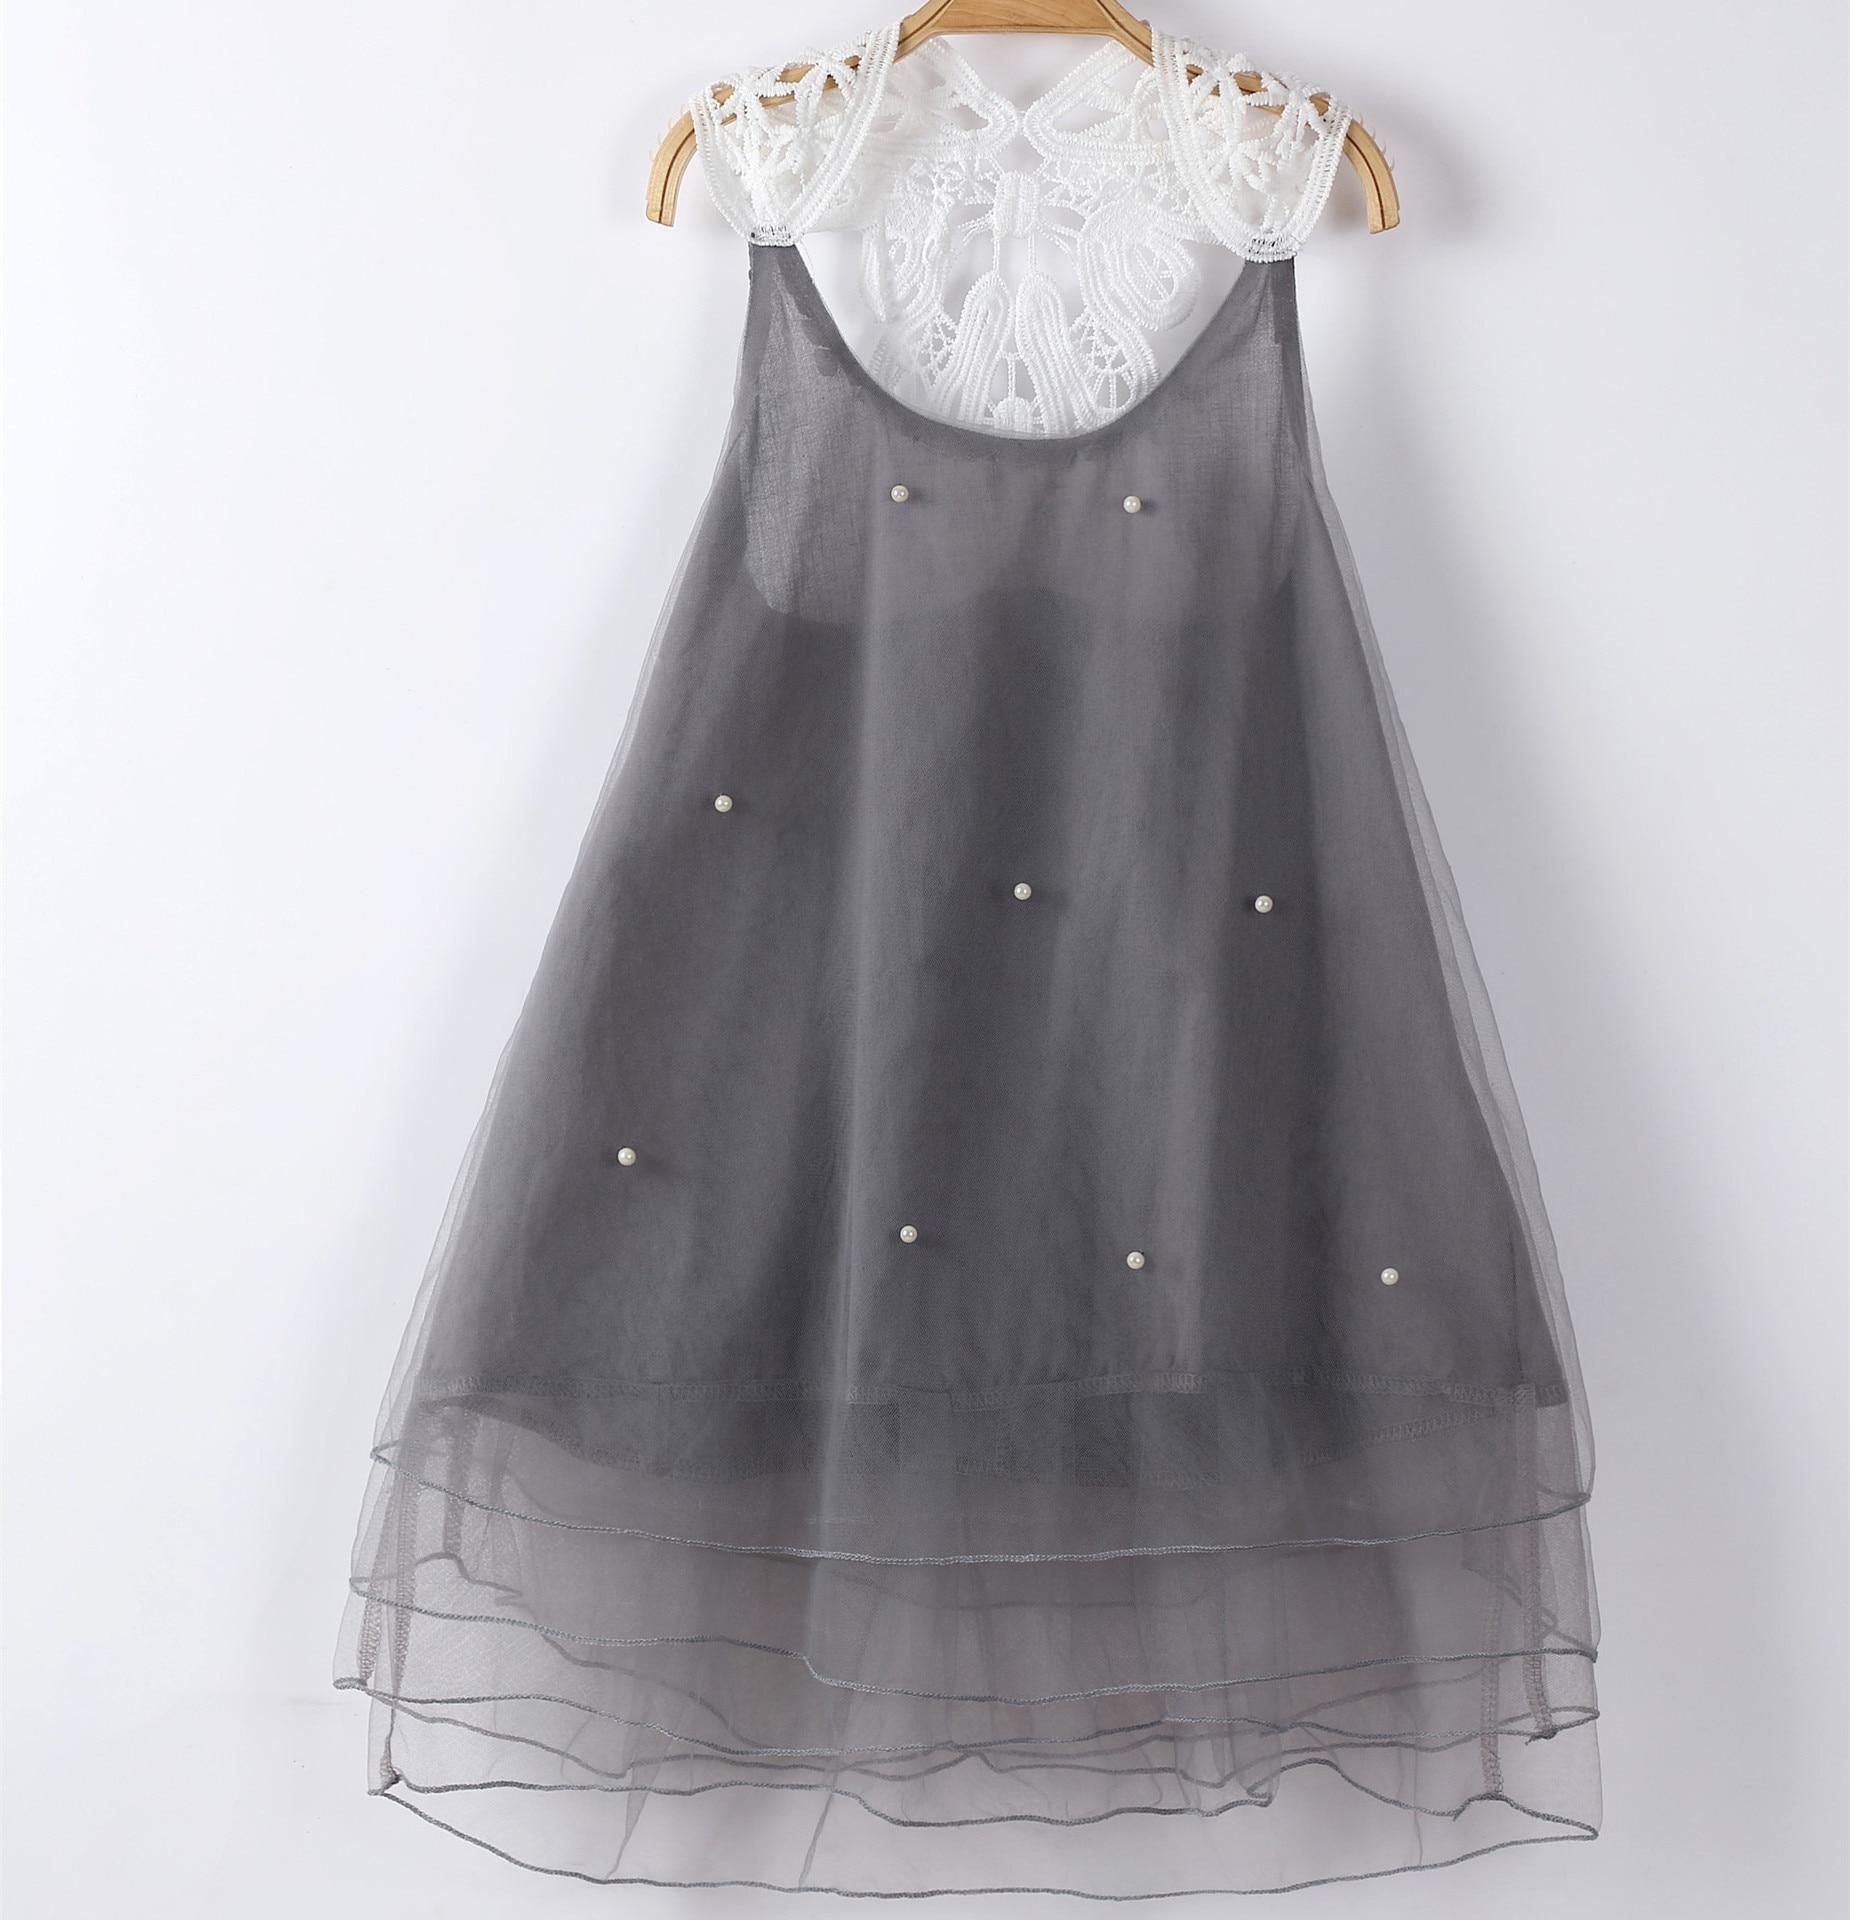 2020 New Summer Pearl Girls Lace Dress Gauze Princess Dress Baby Girls Clothes Wedding Flower Girls Lace Dress 1-8Y Skirt